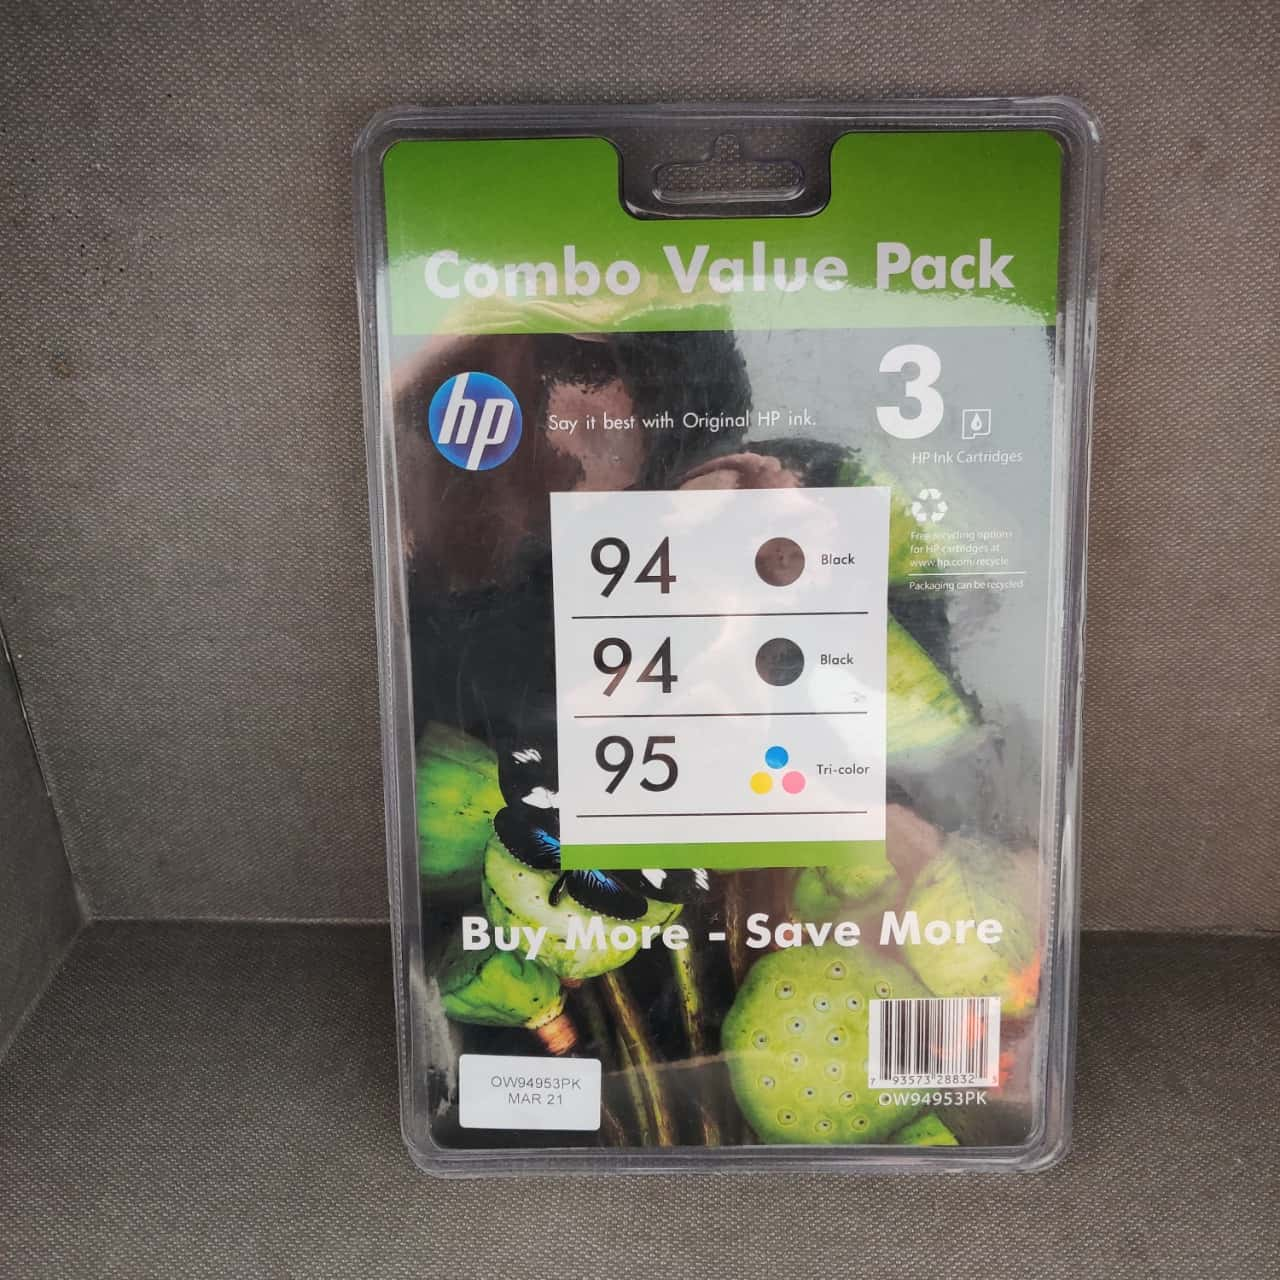 HP 94 & 95 Inkjet Cartridges for HP Deskjet printers as per photo list